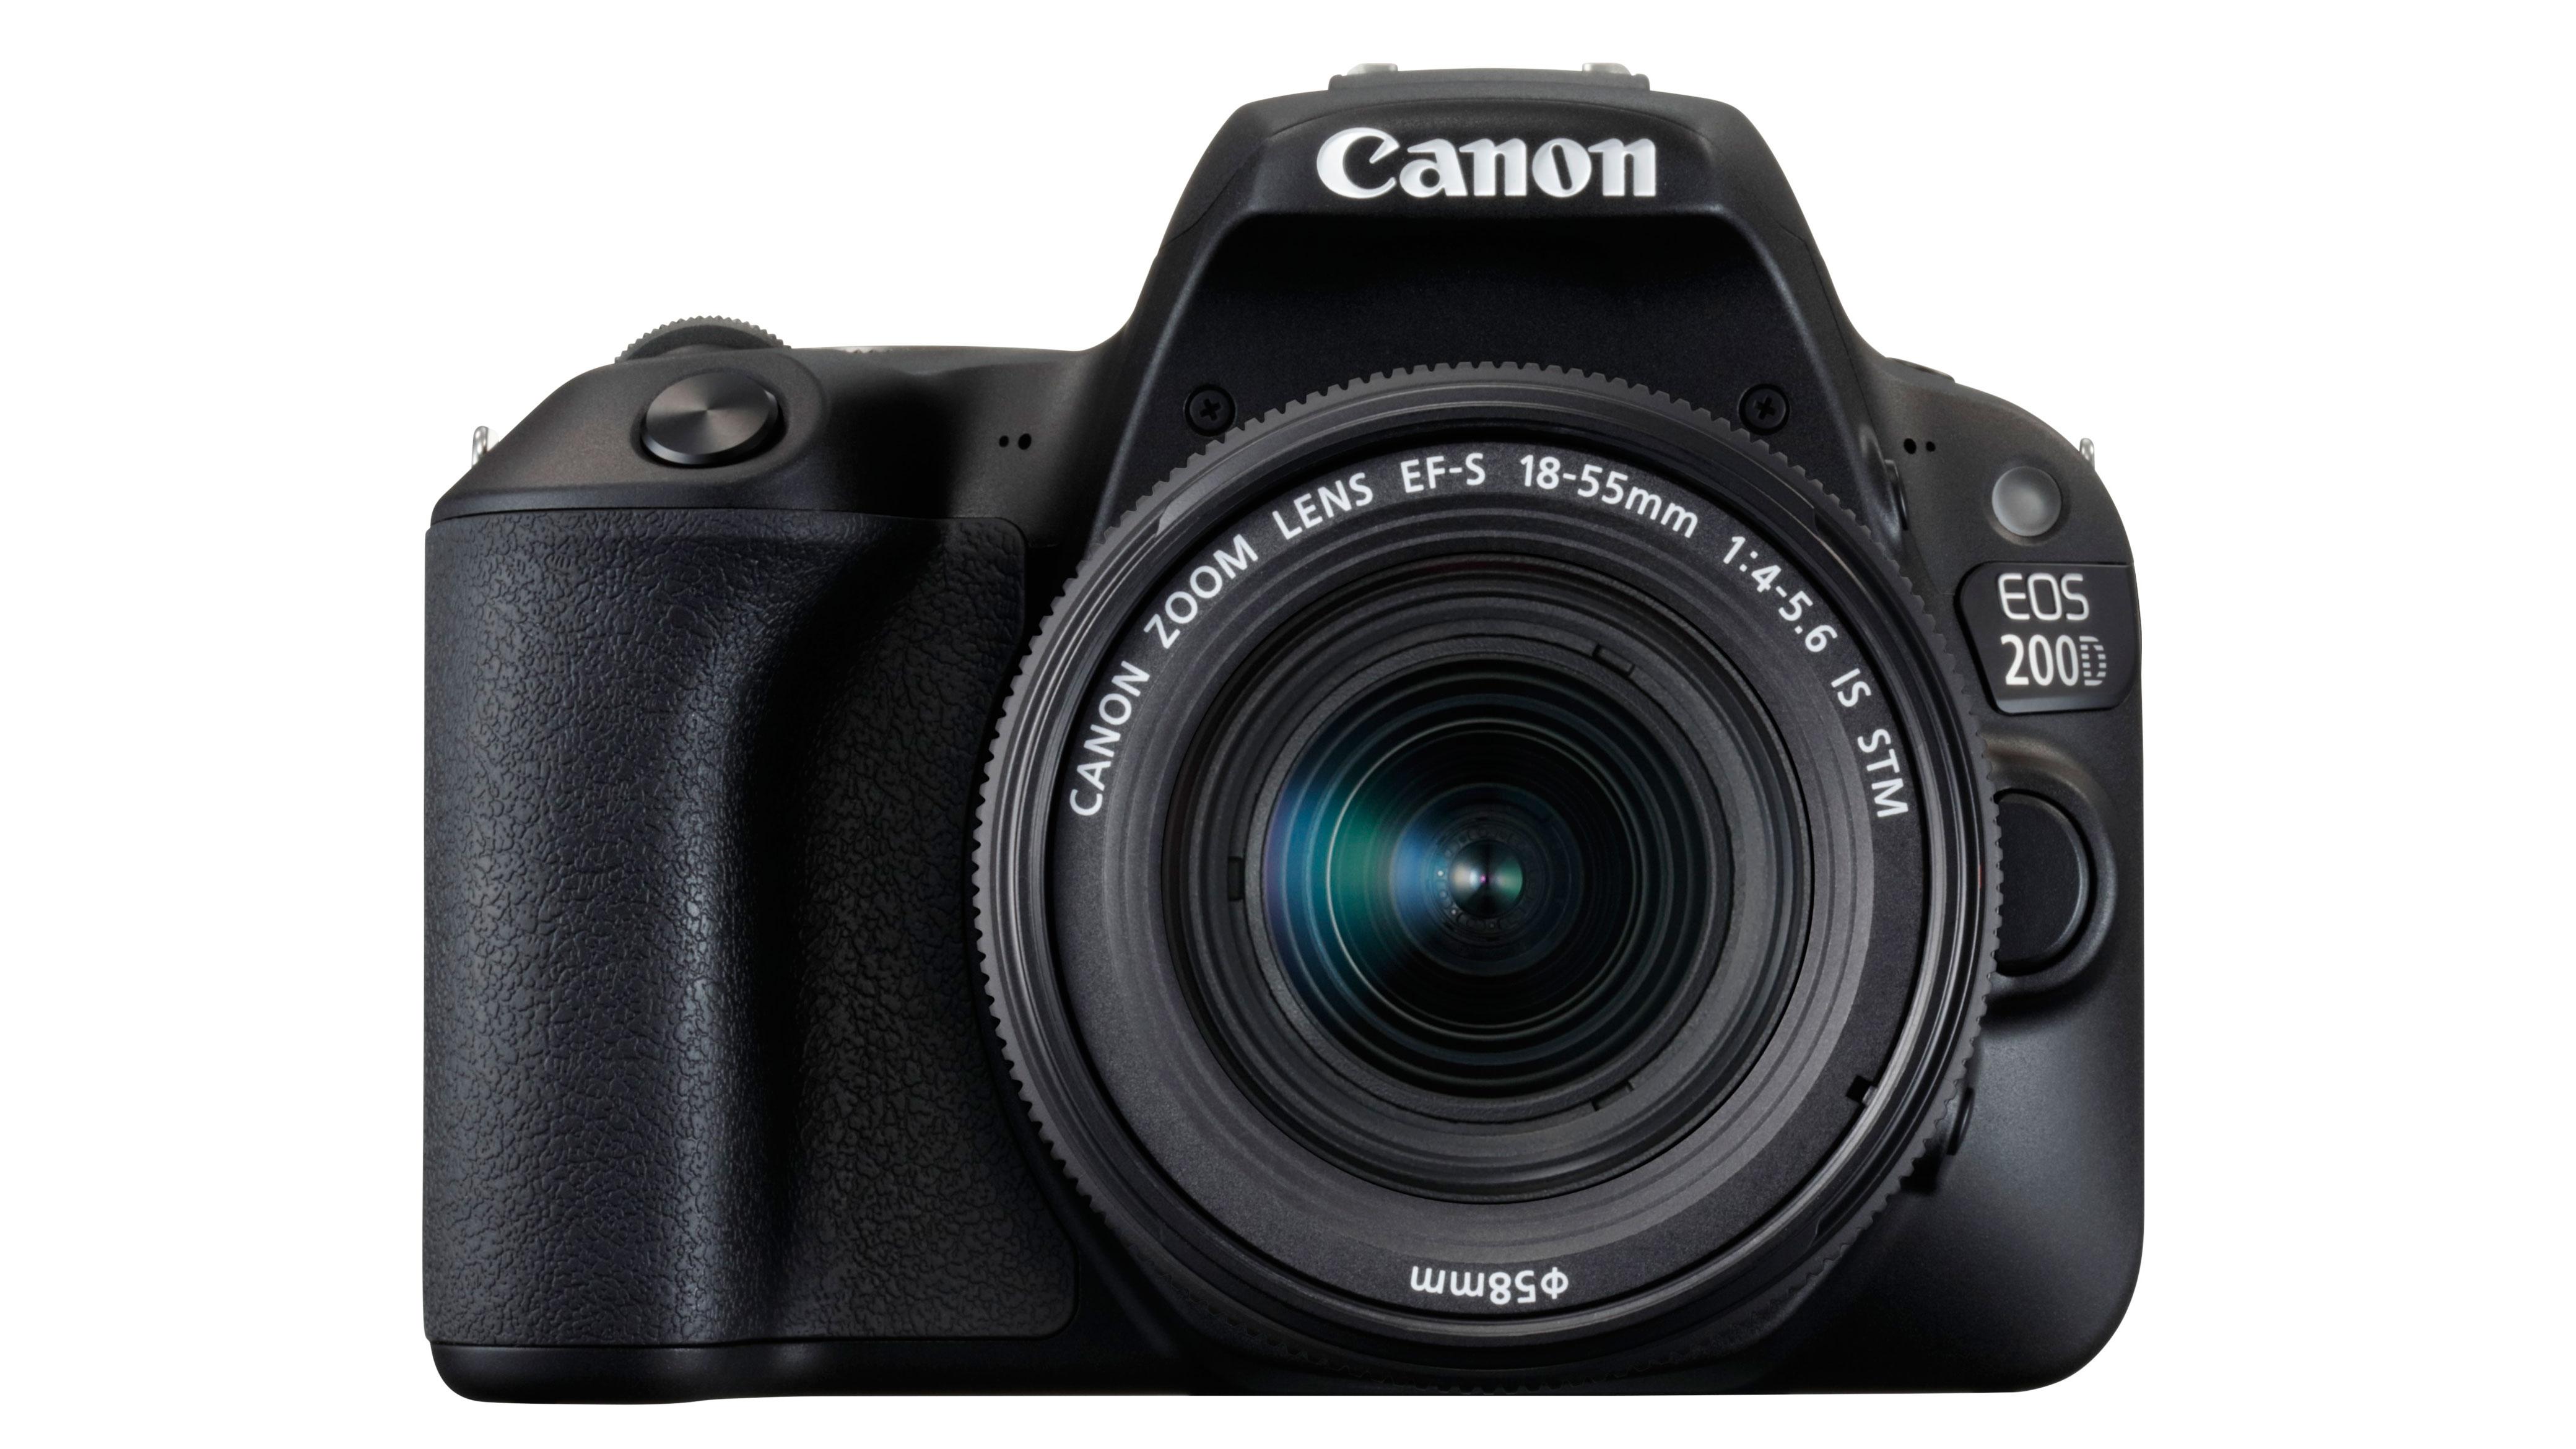 Digitale canon fotocamera vergelijk 1